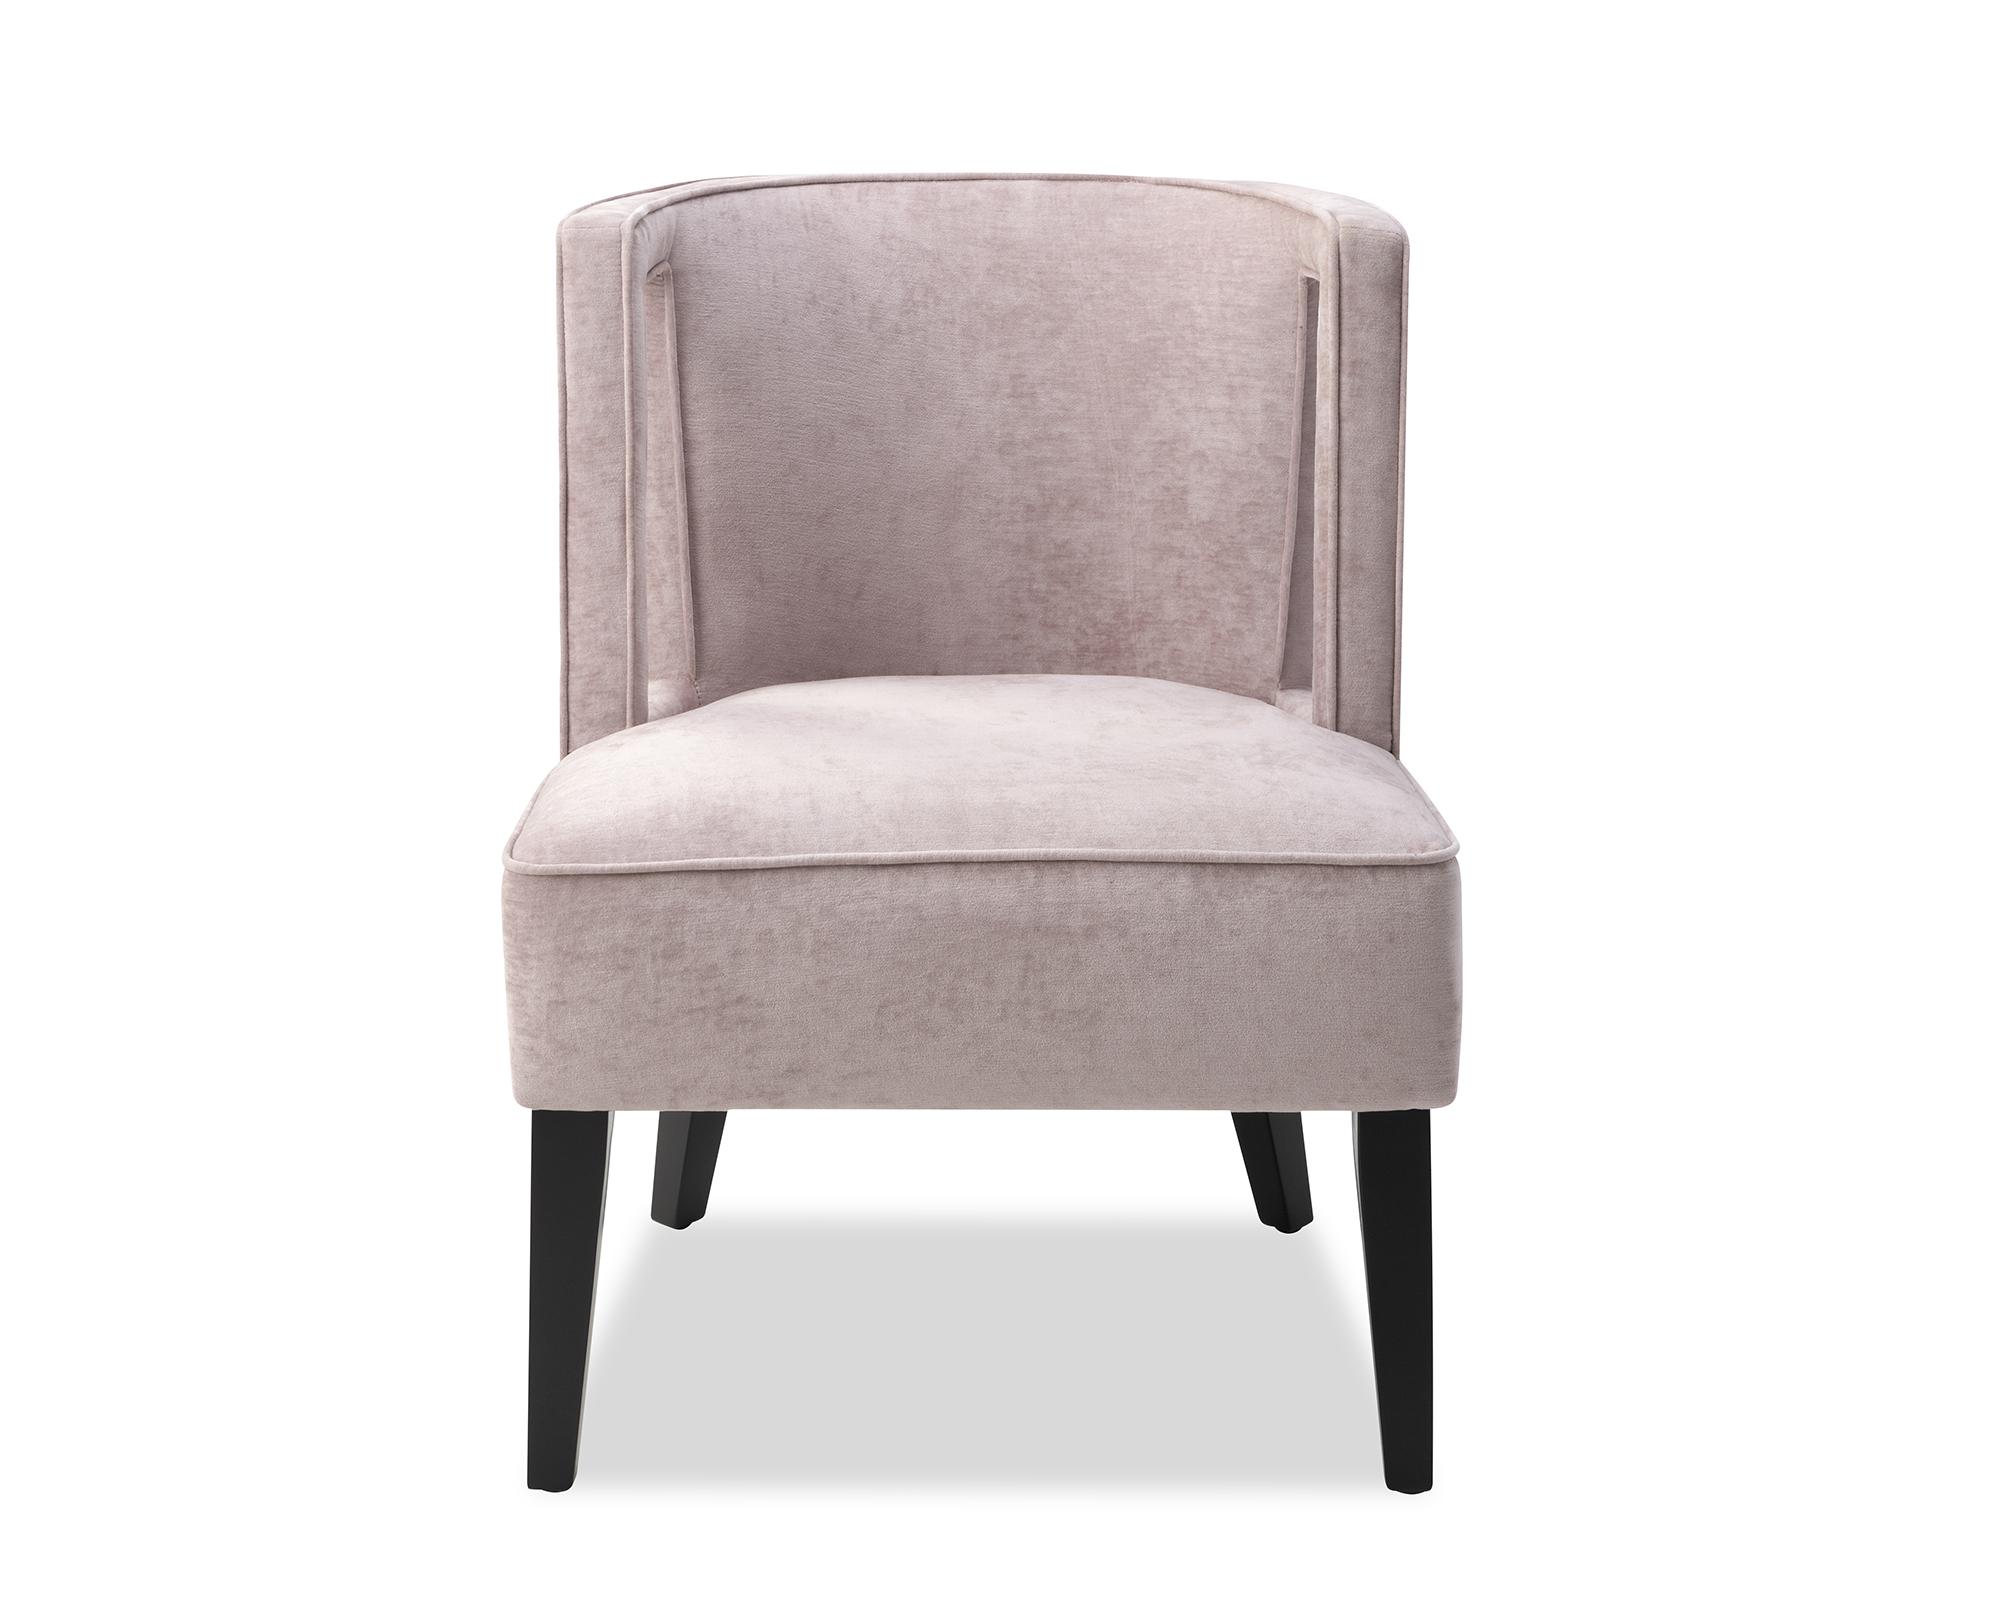 Liang & Eimil Cara Occasional Chair Lavender Velvet BH-OCH-083 (2)